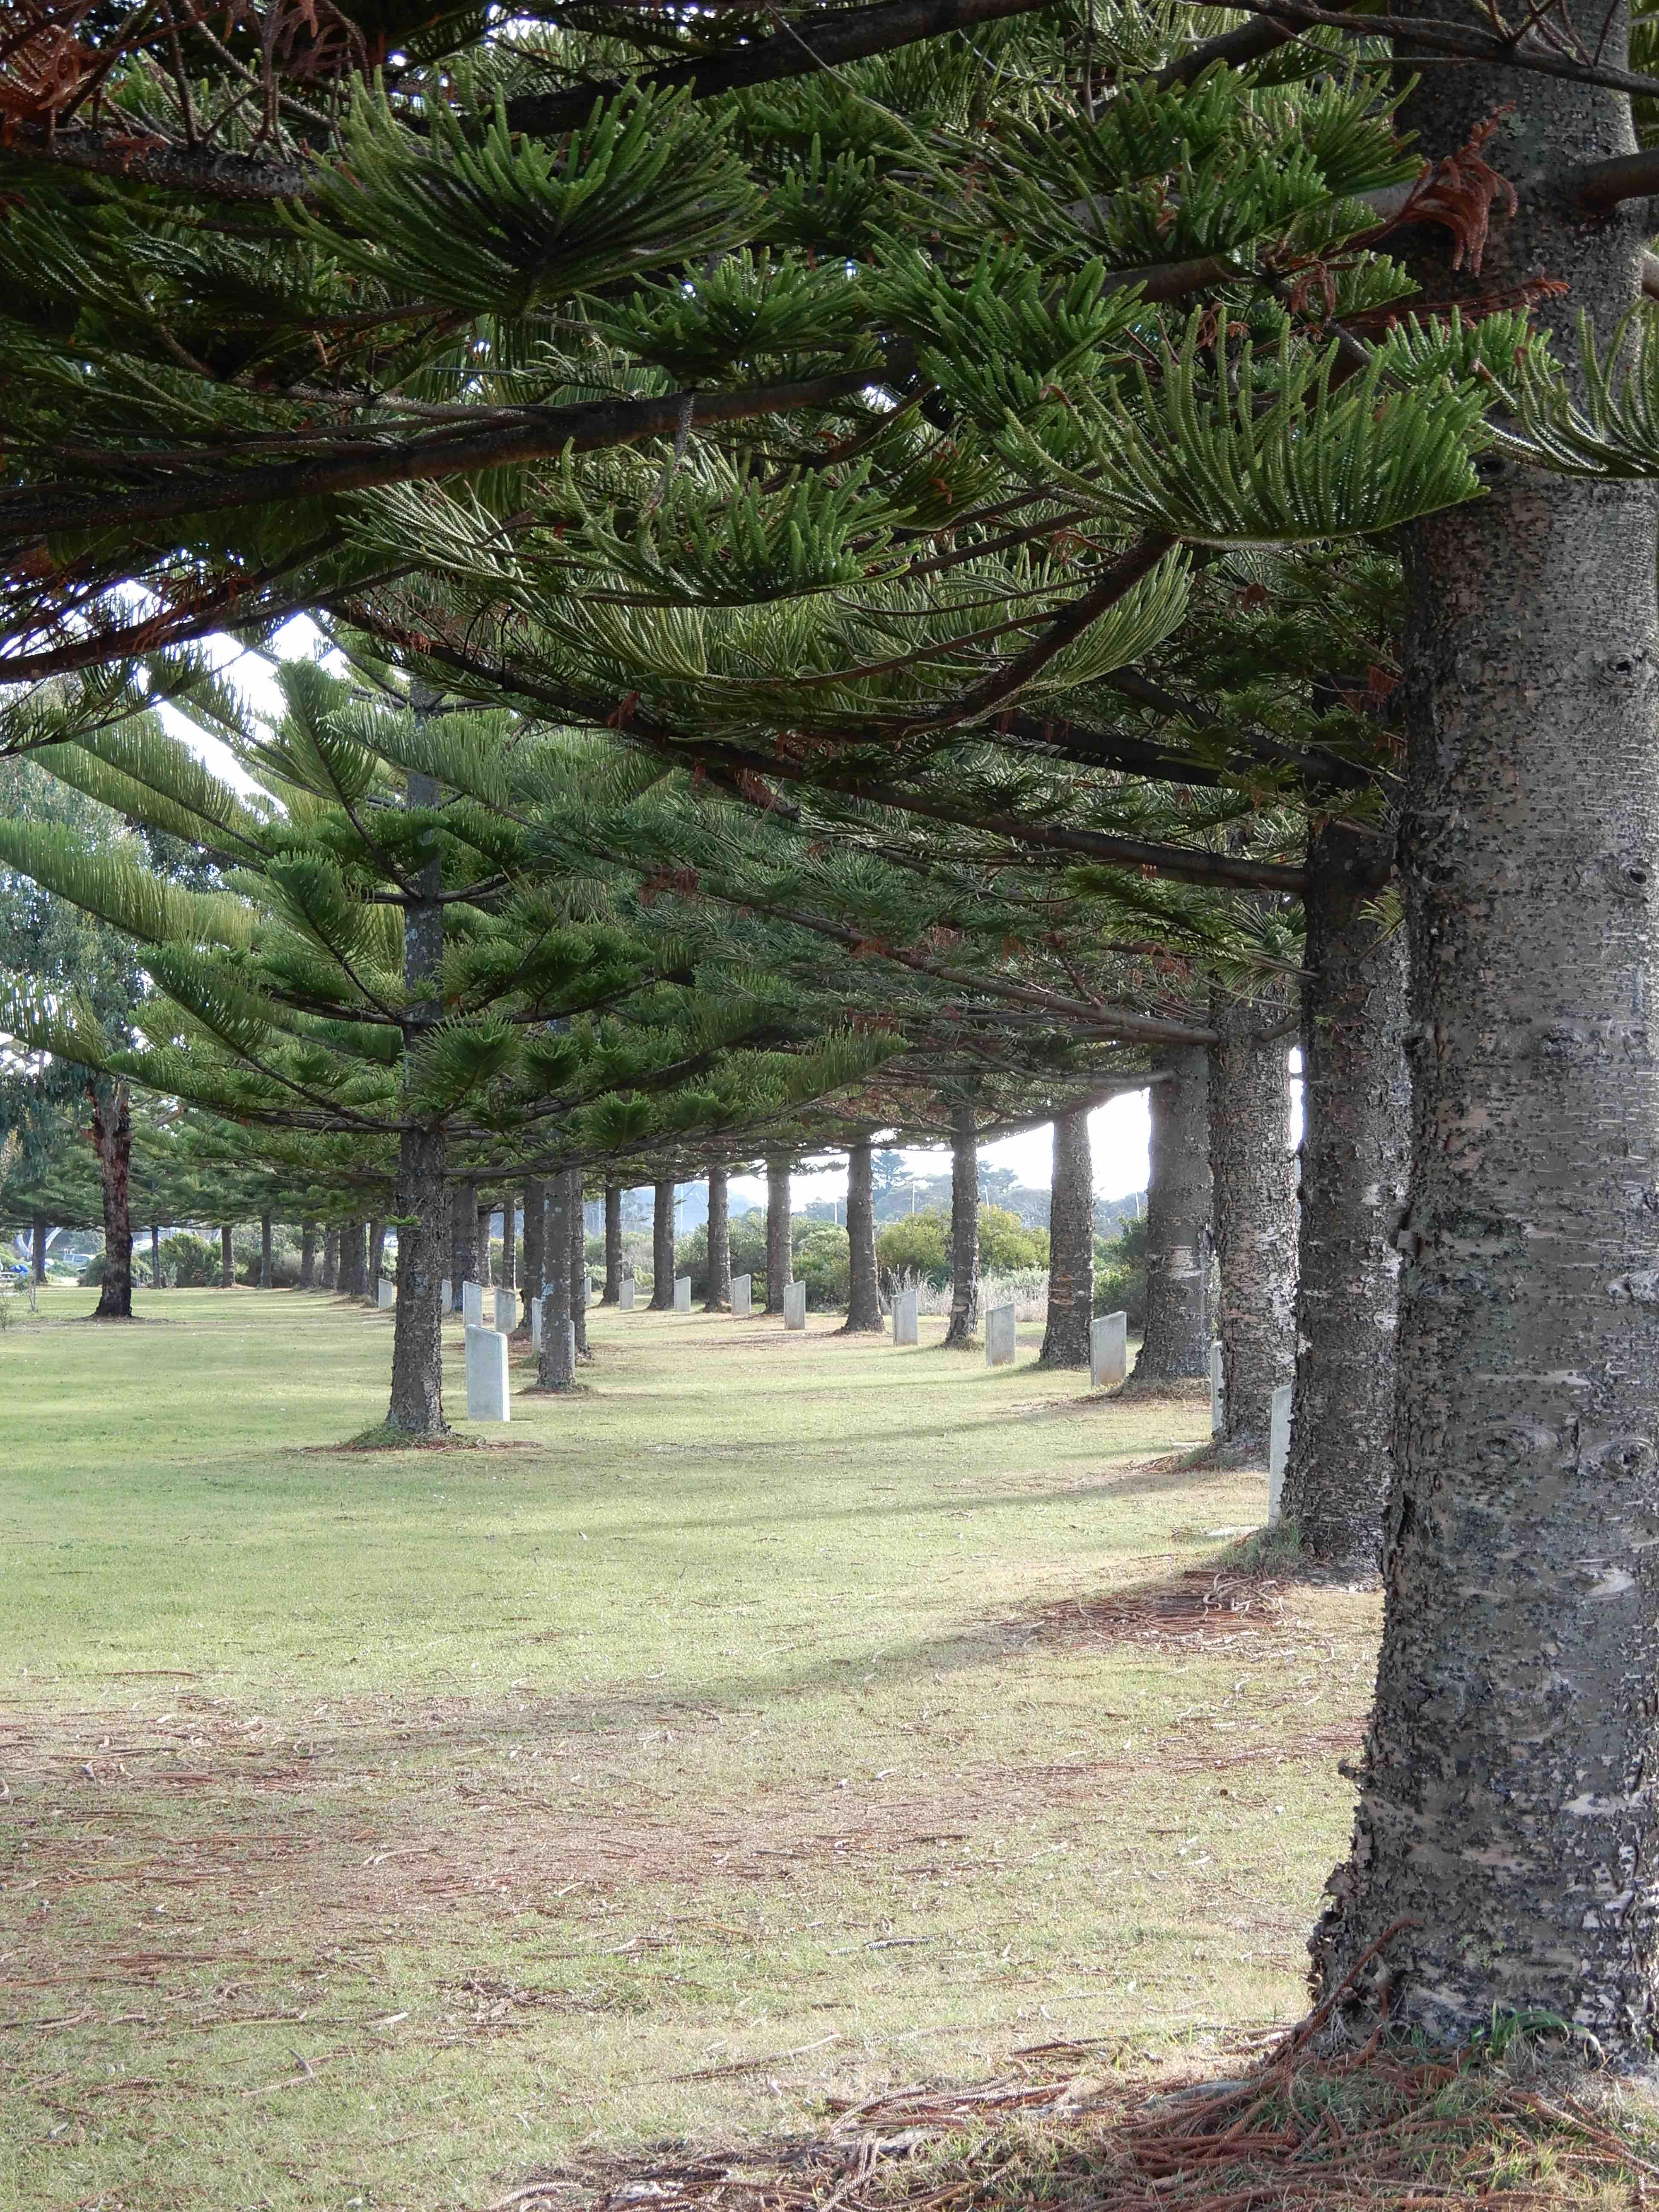 28.Norfolk Pines memorial